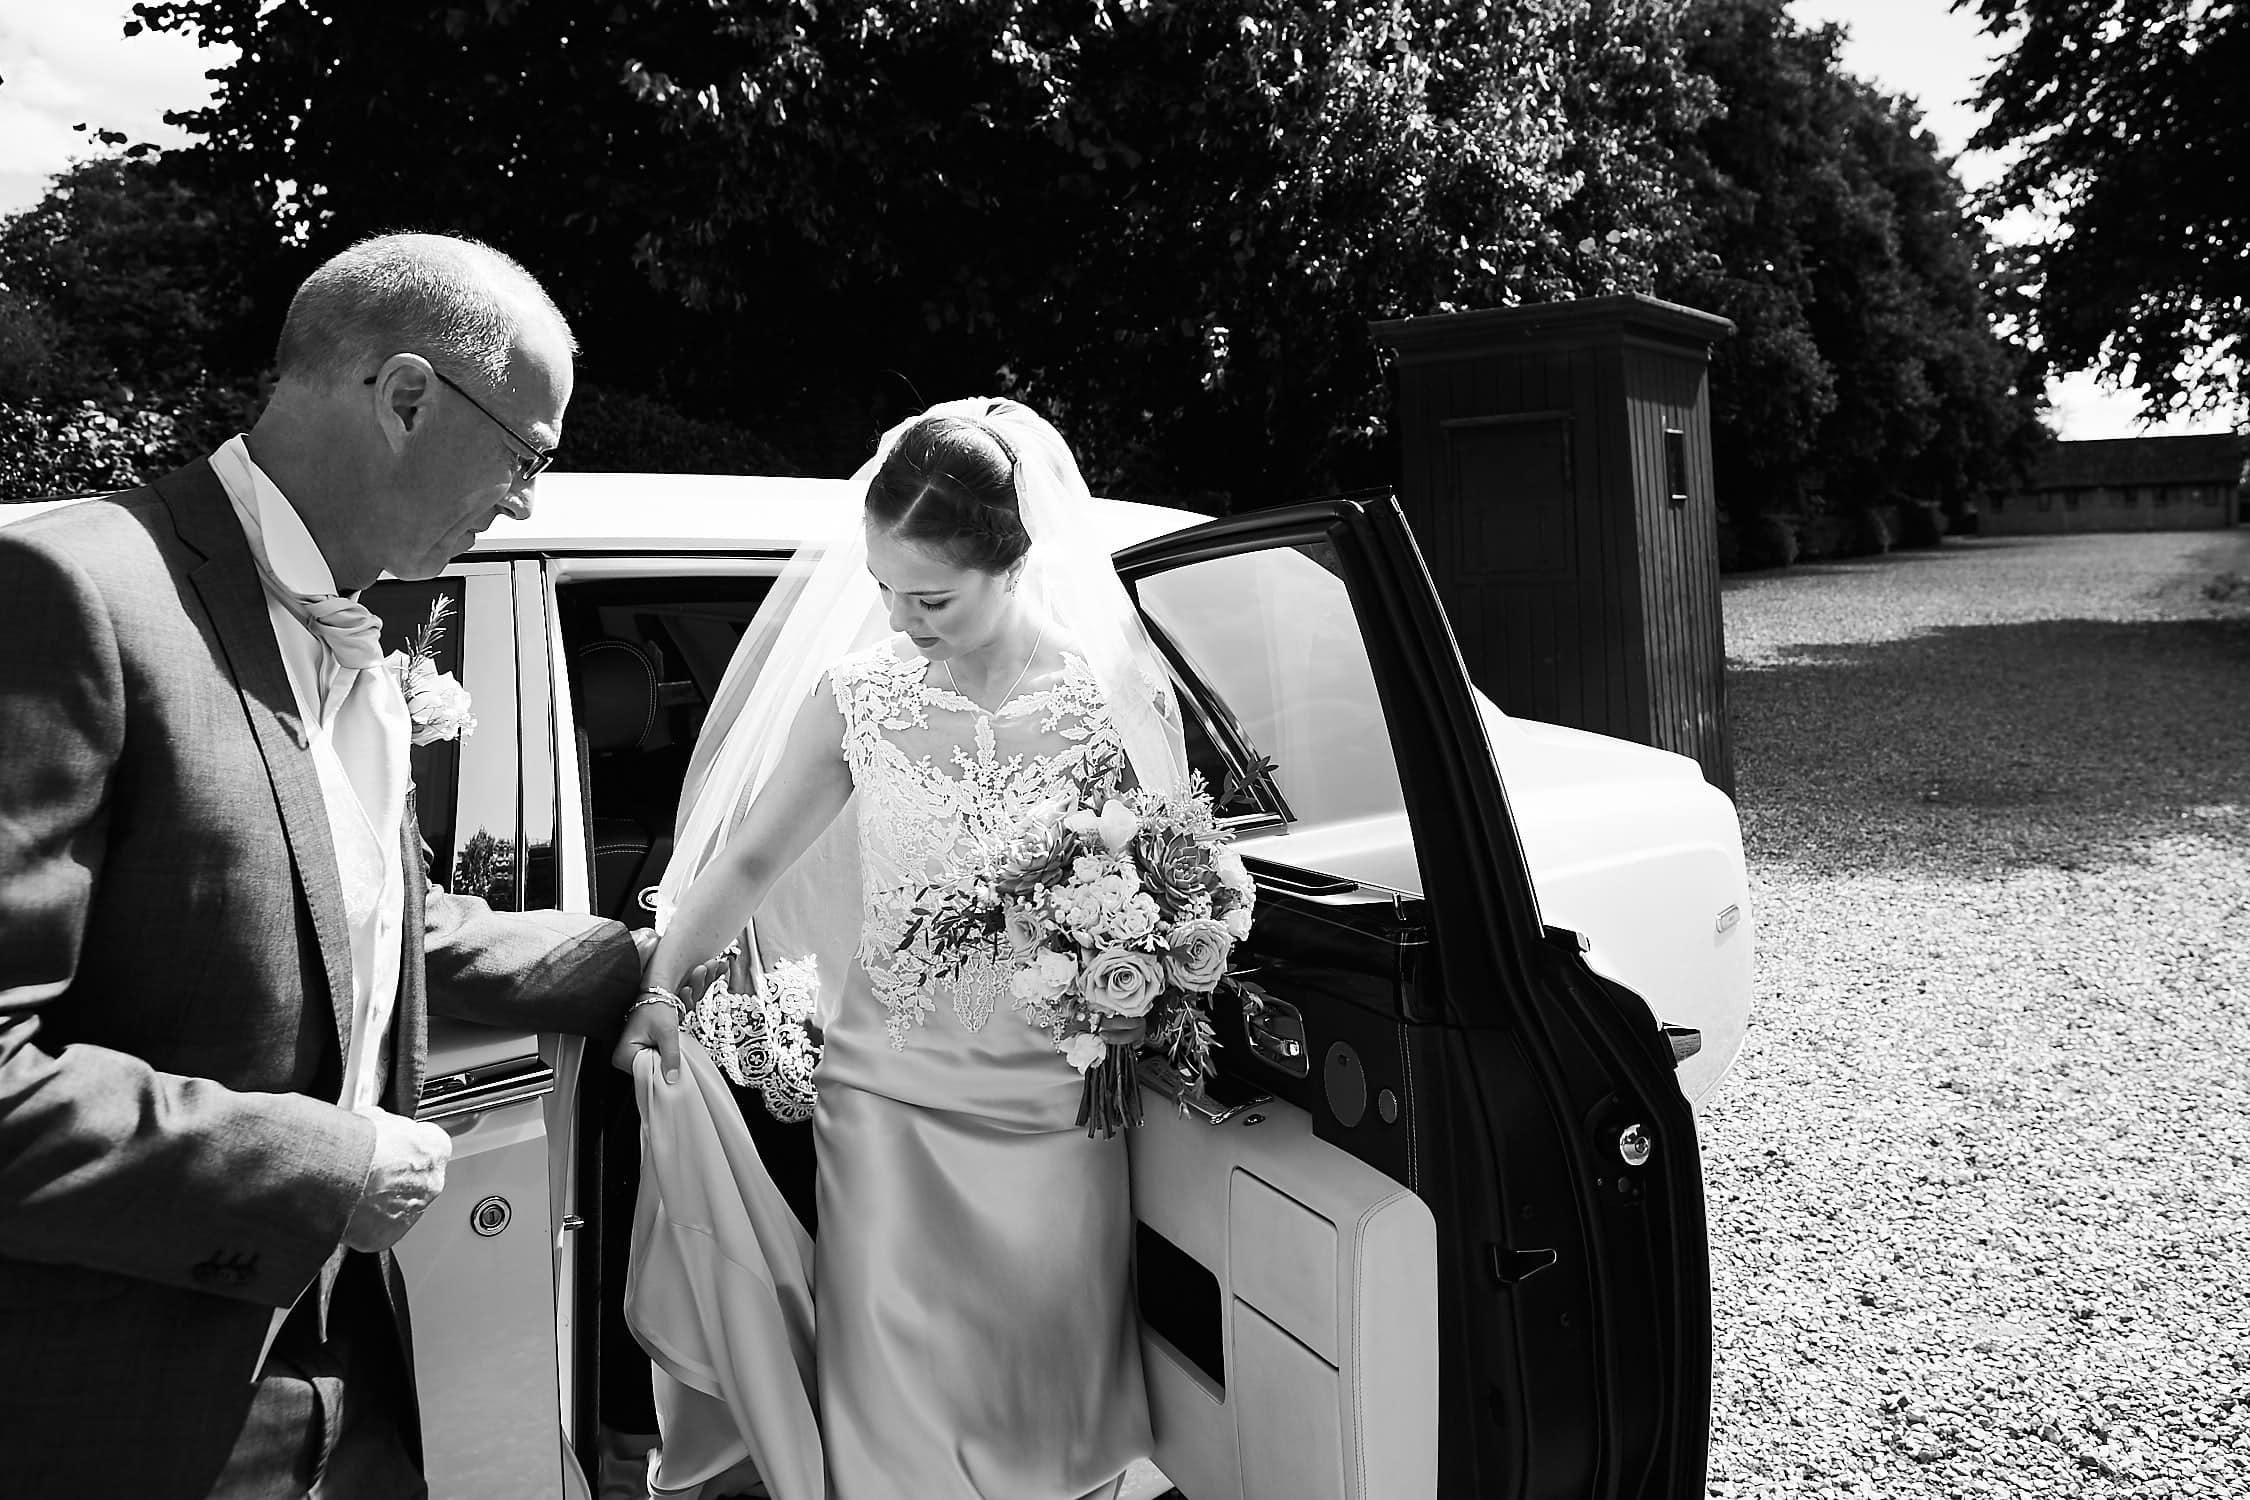 Bride leaving car on wedding day arrival